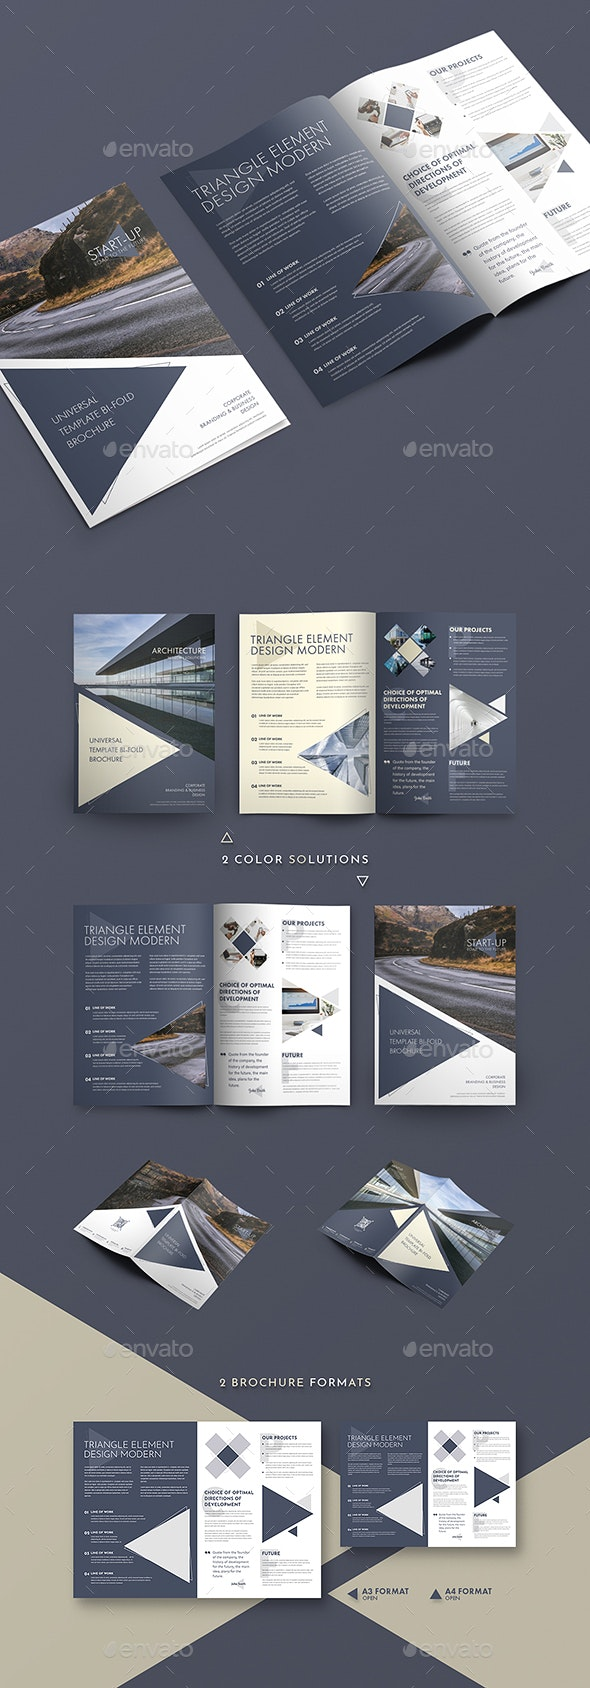 Modern Design Bi-Fold Brochure With Triangular Elements - Brochures Print Templates